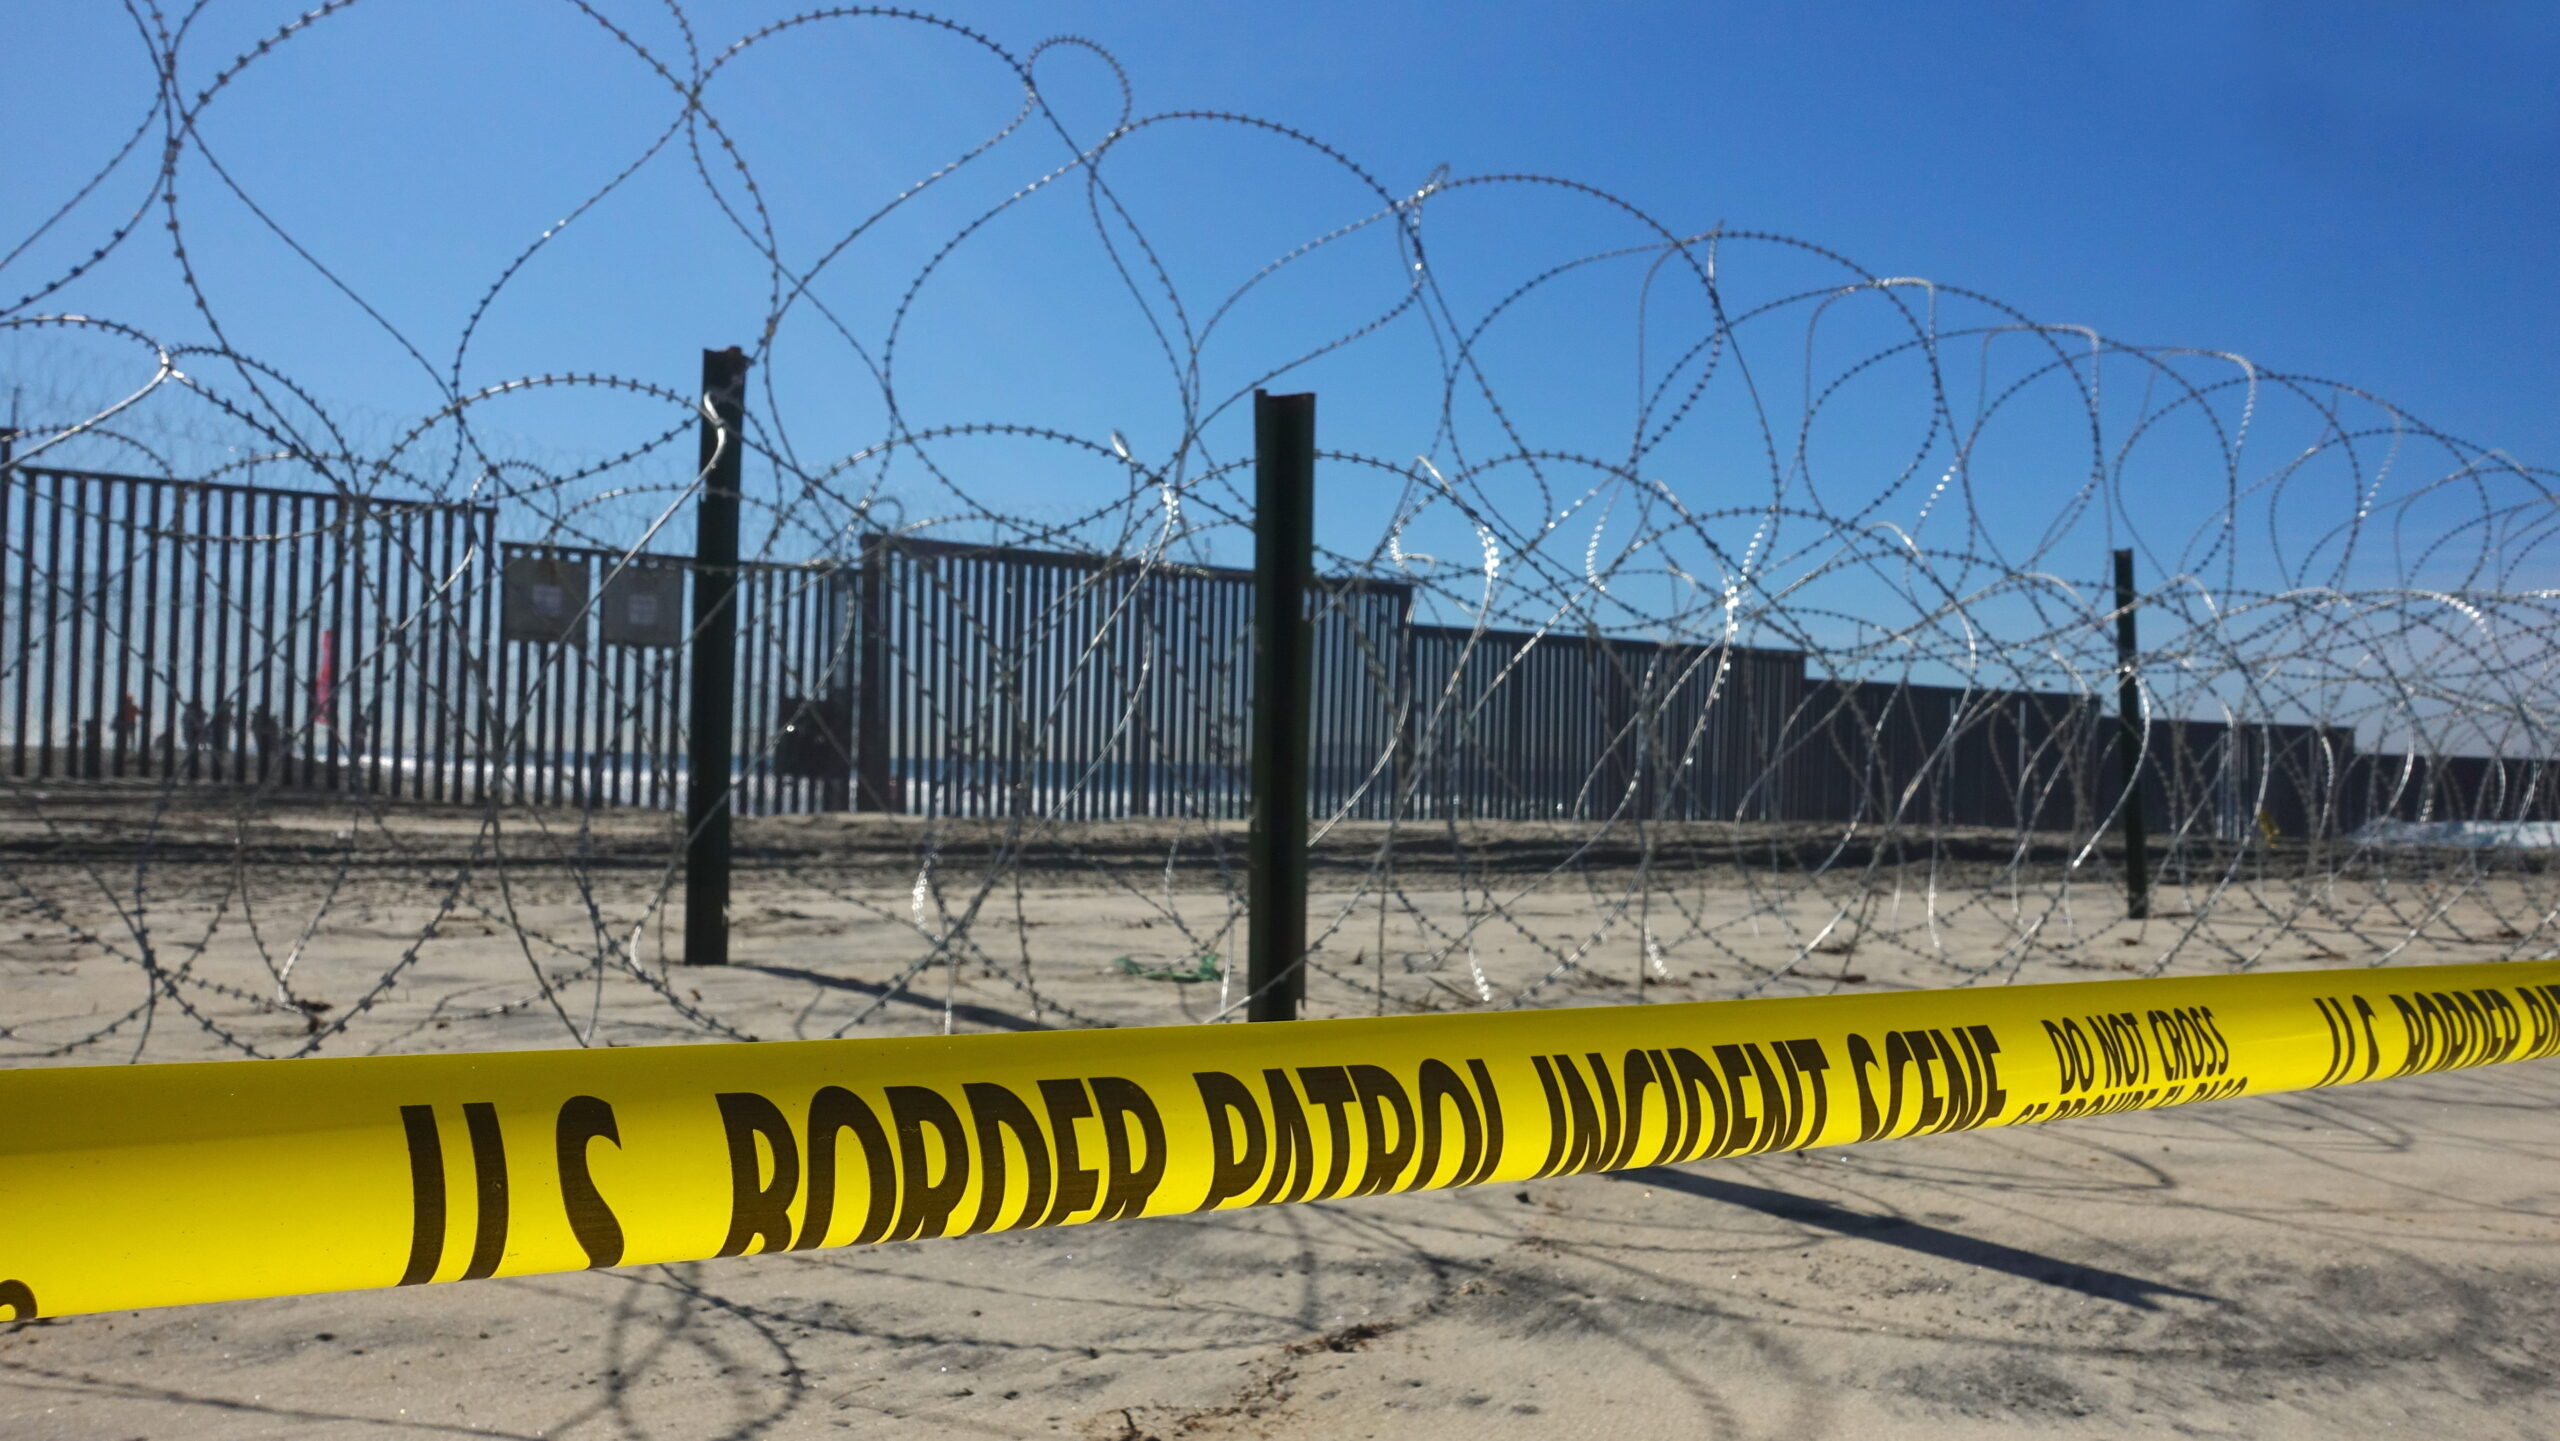 Ignoring Border Crisis ≠ Crisis Solved 😨